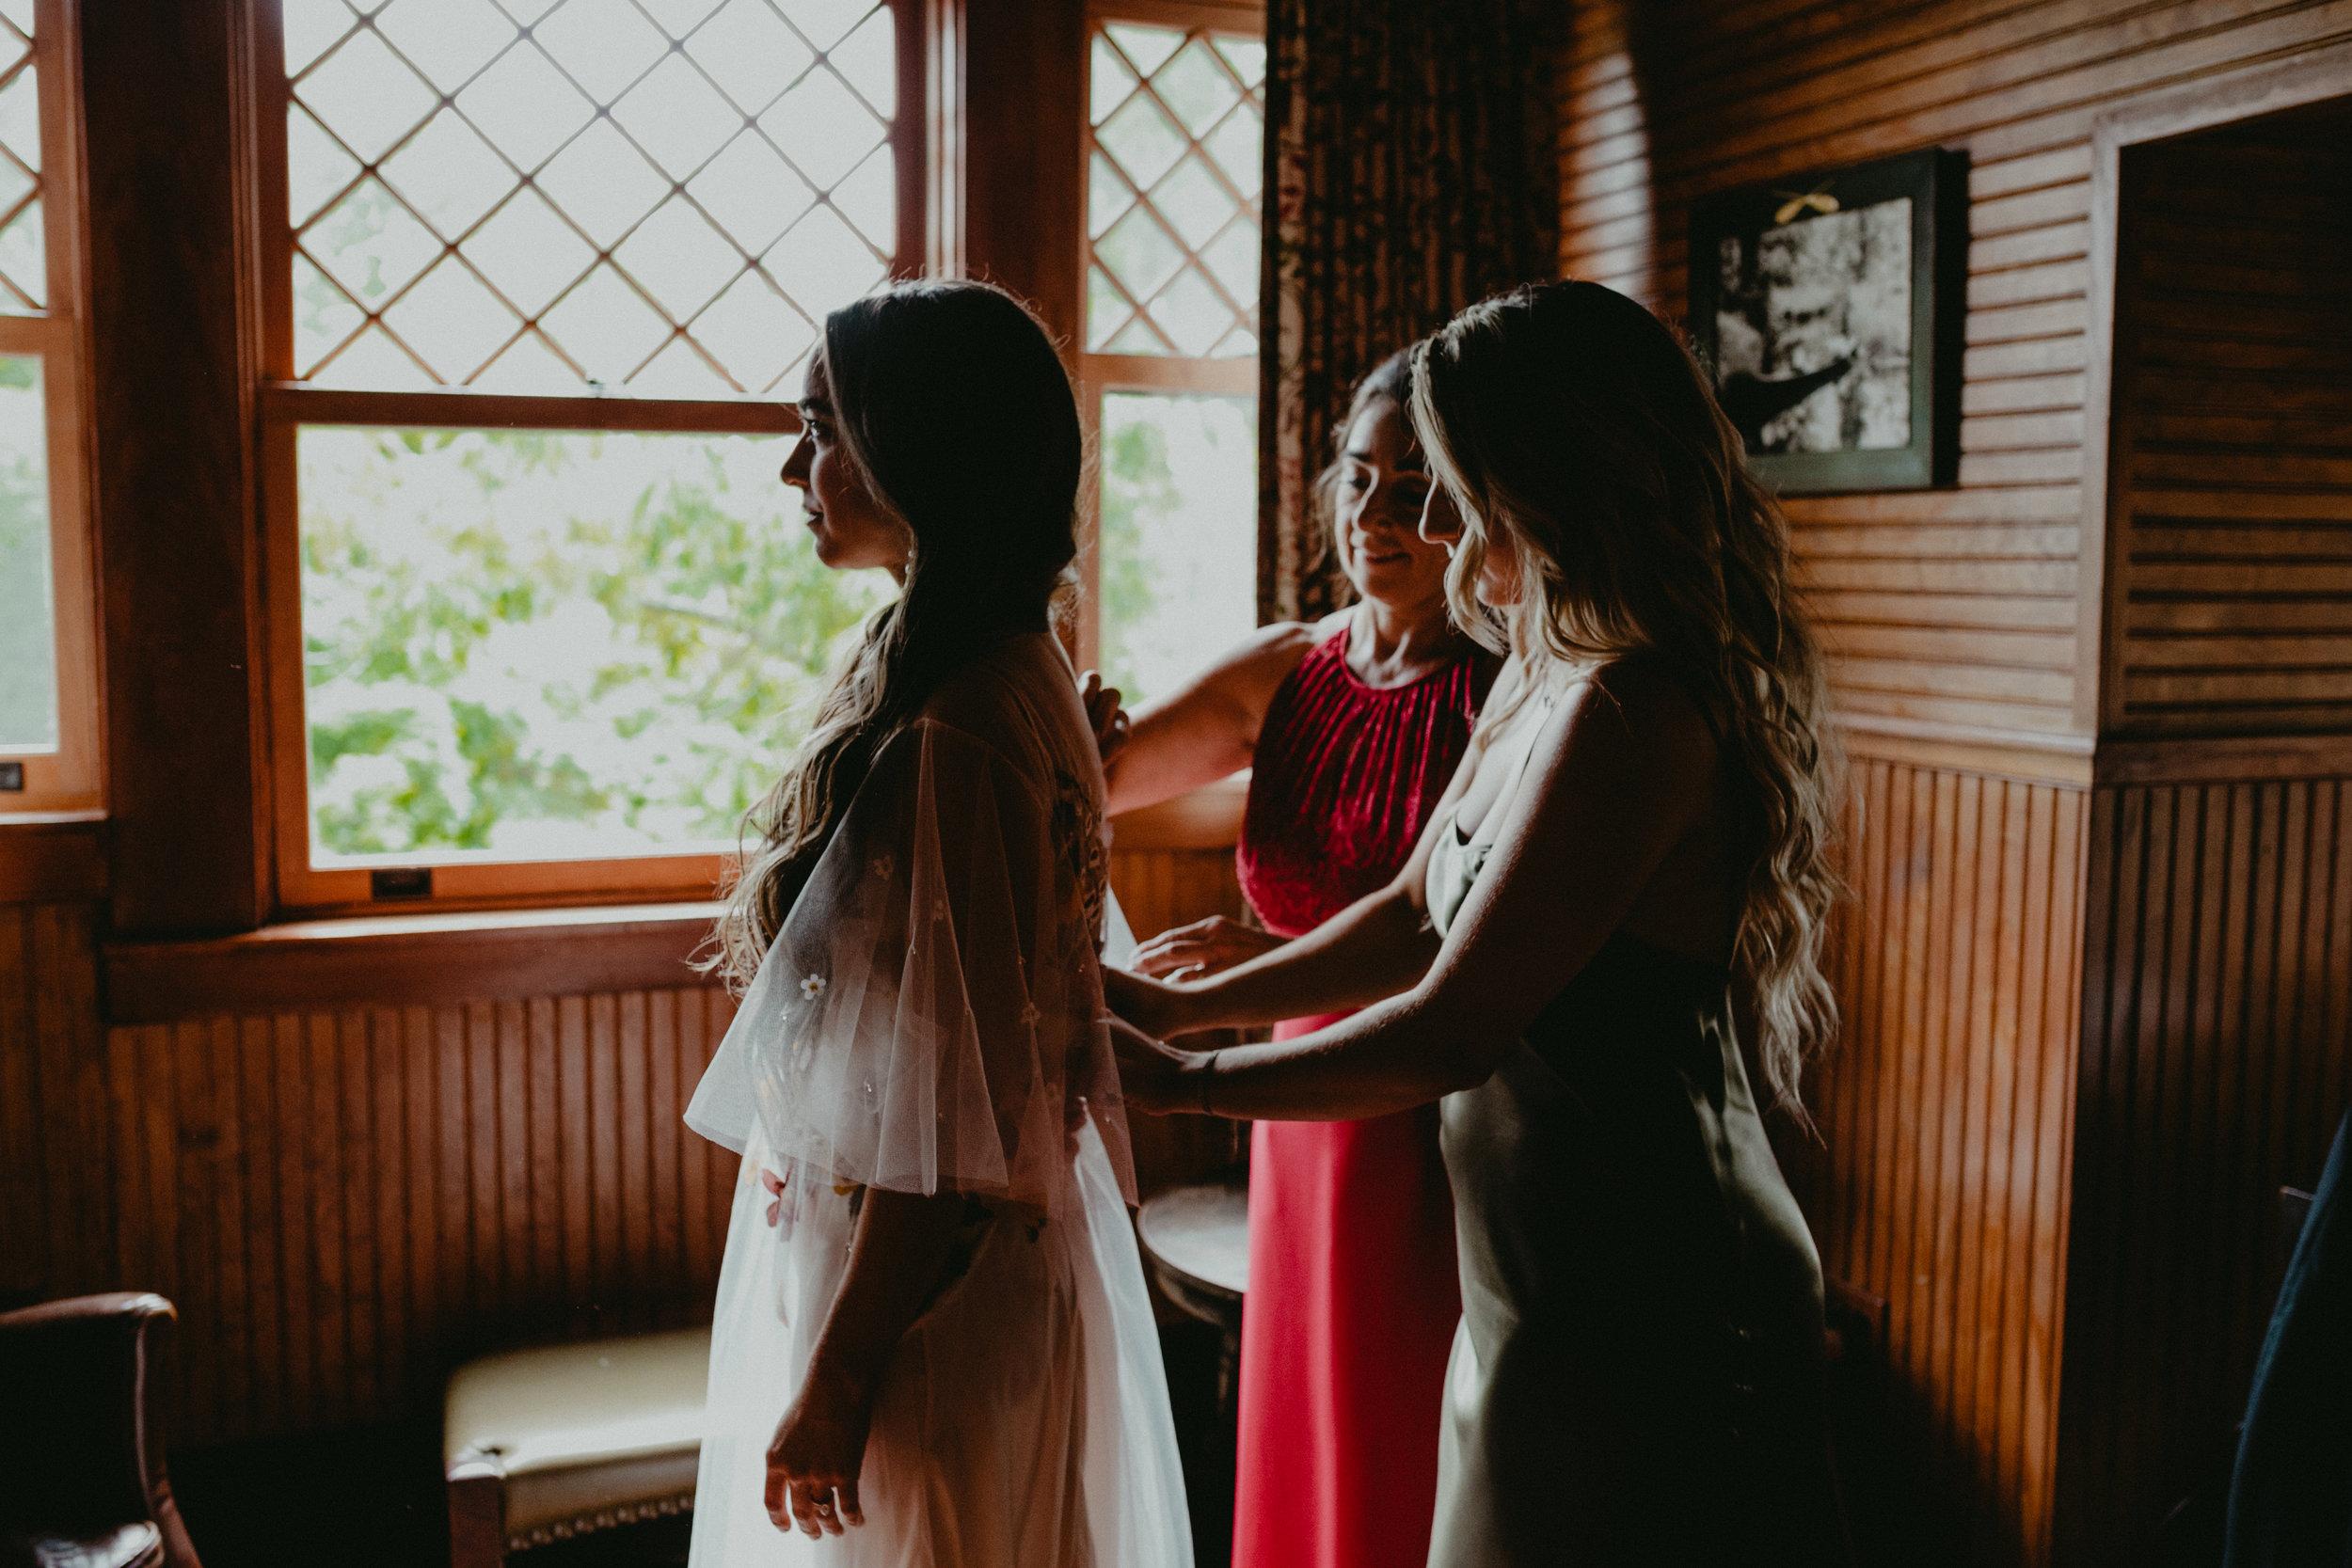 DEER_MOUNTAIN_INN_WEDDING_CHELLISE_MICHAEL_PHOTOGRAPHY-1109.jpg